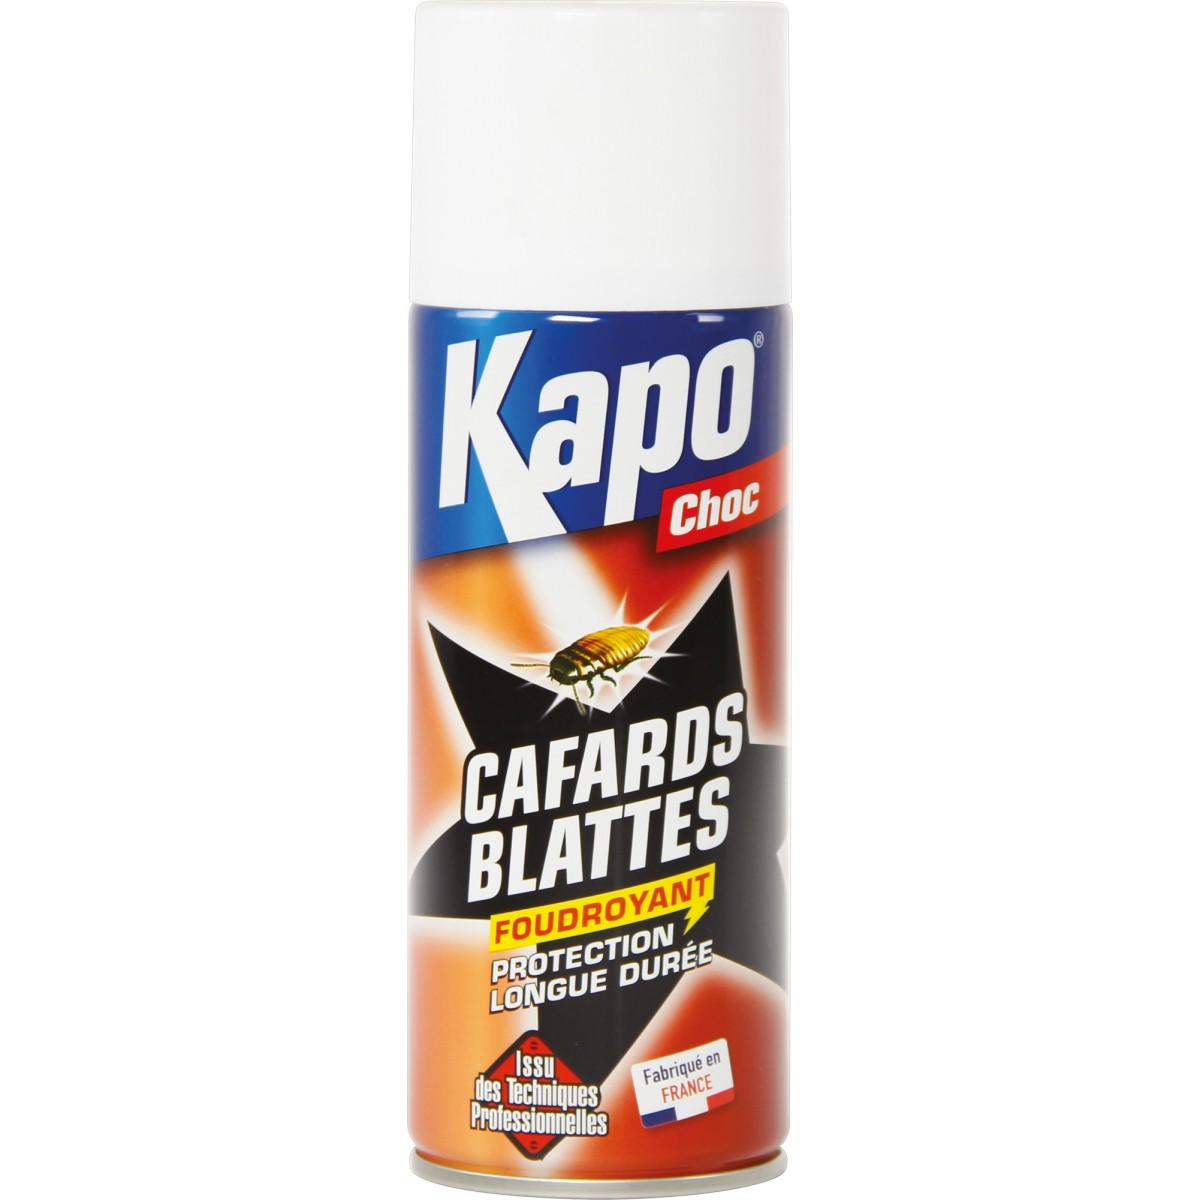 cafards et blattes kapo choc a rosol 400 ml de insecticide cafards et blattes. Black Bedroom Furniture Sets. Home Design Ideas